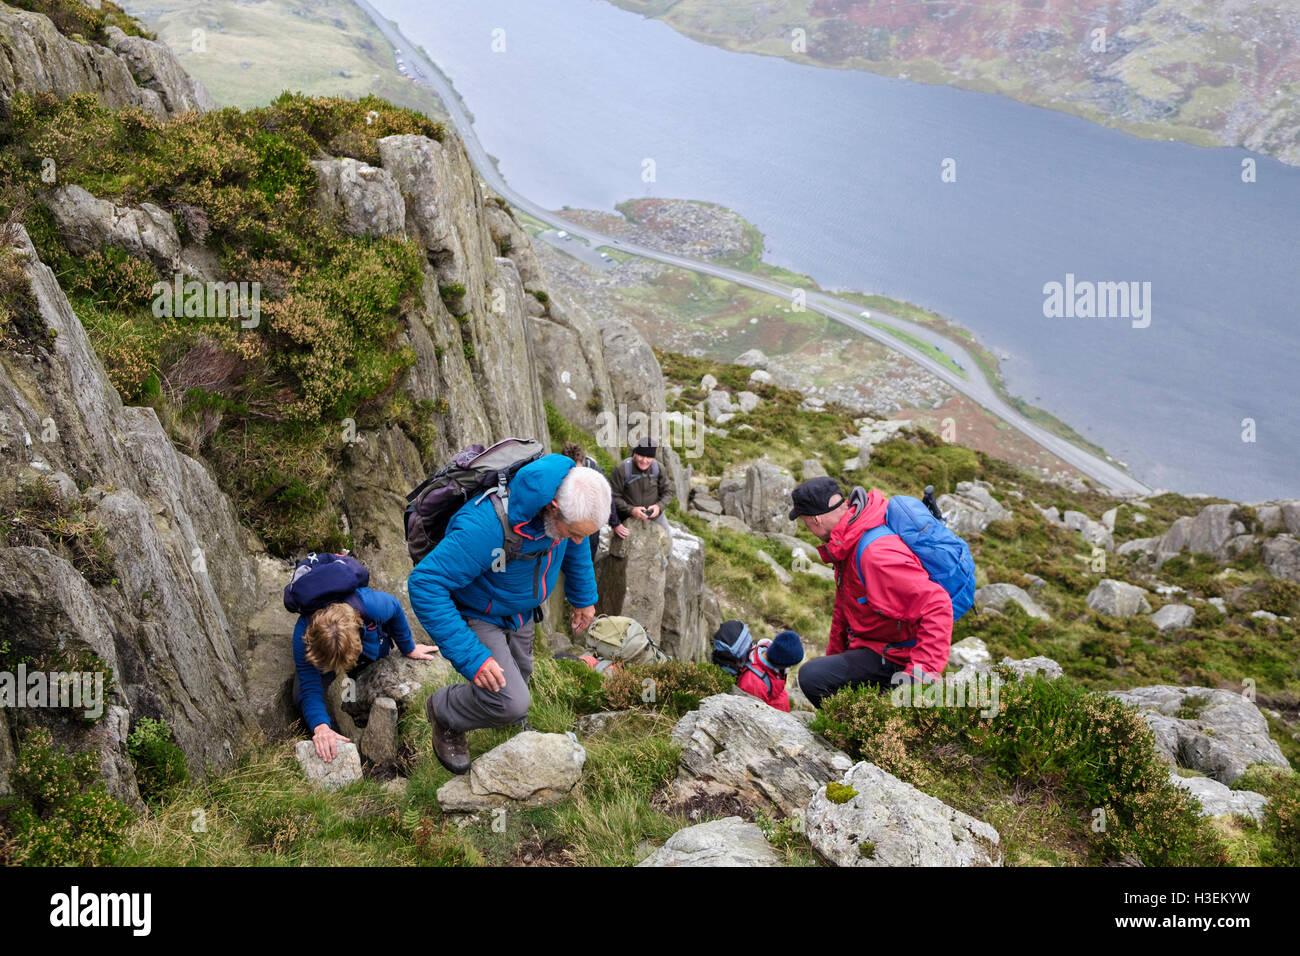 Hikers scrambling up Mount Tryfan north ridge above Llyn Ogwen in mountains of Snowdonia National Park (Eryri). - Stock Image